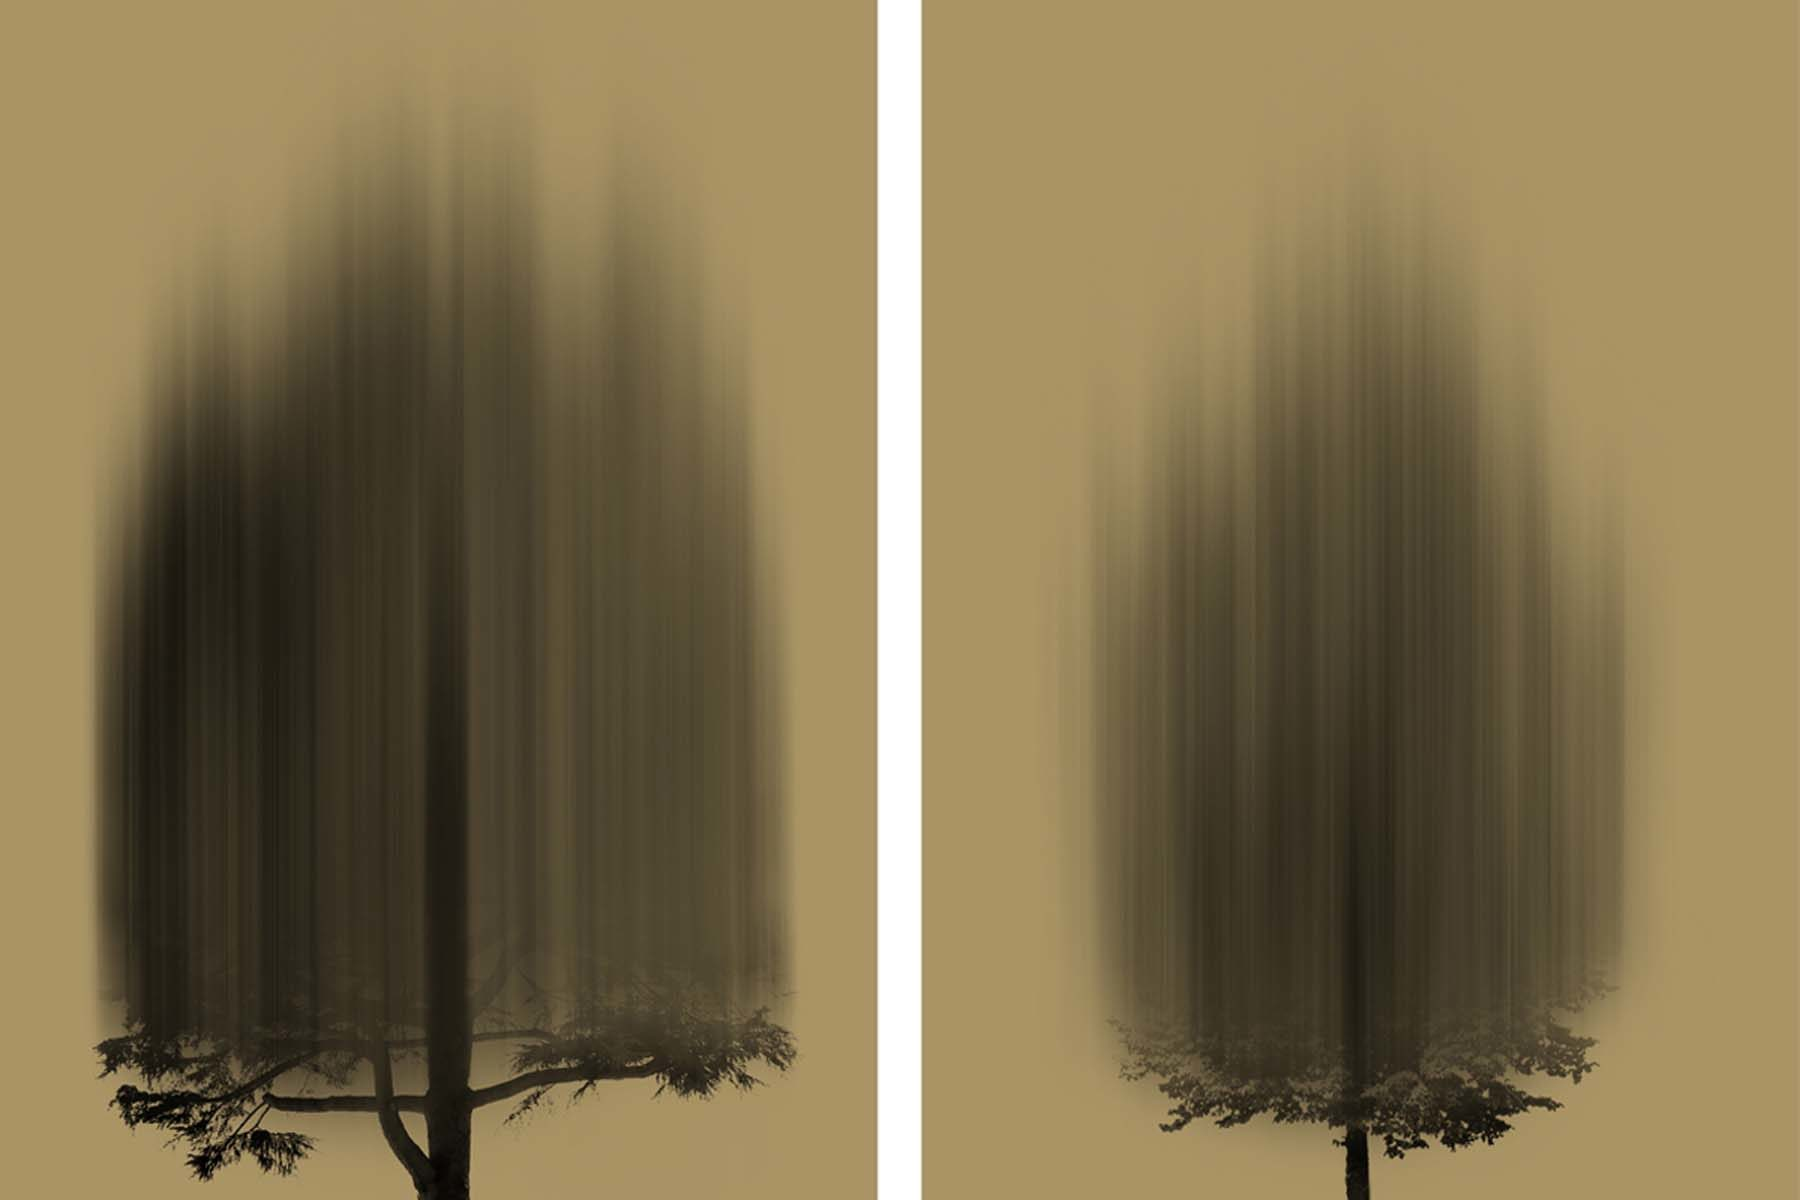 G. Dell'Antonia, I miei infiniti Alberi, 2014, print on wood, wax, graphite, each 35 x 25 cm